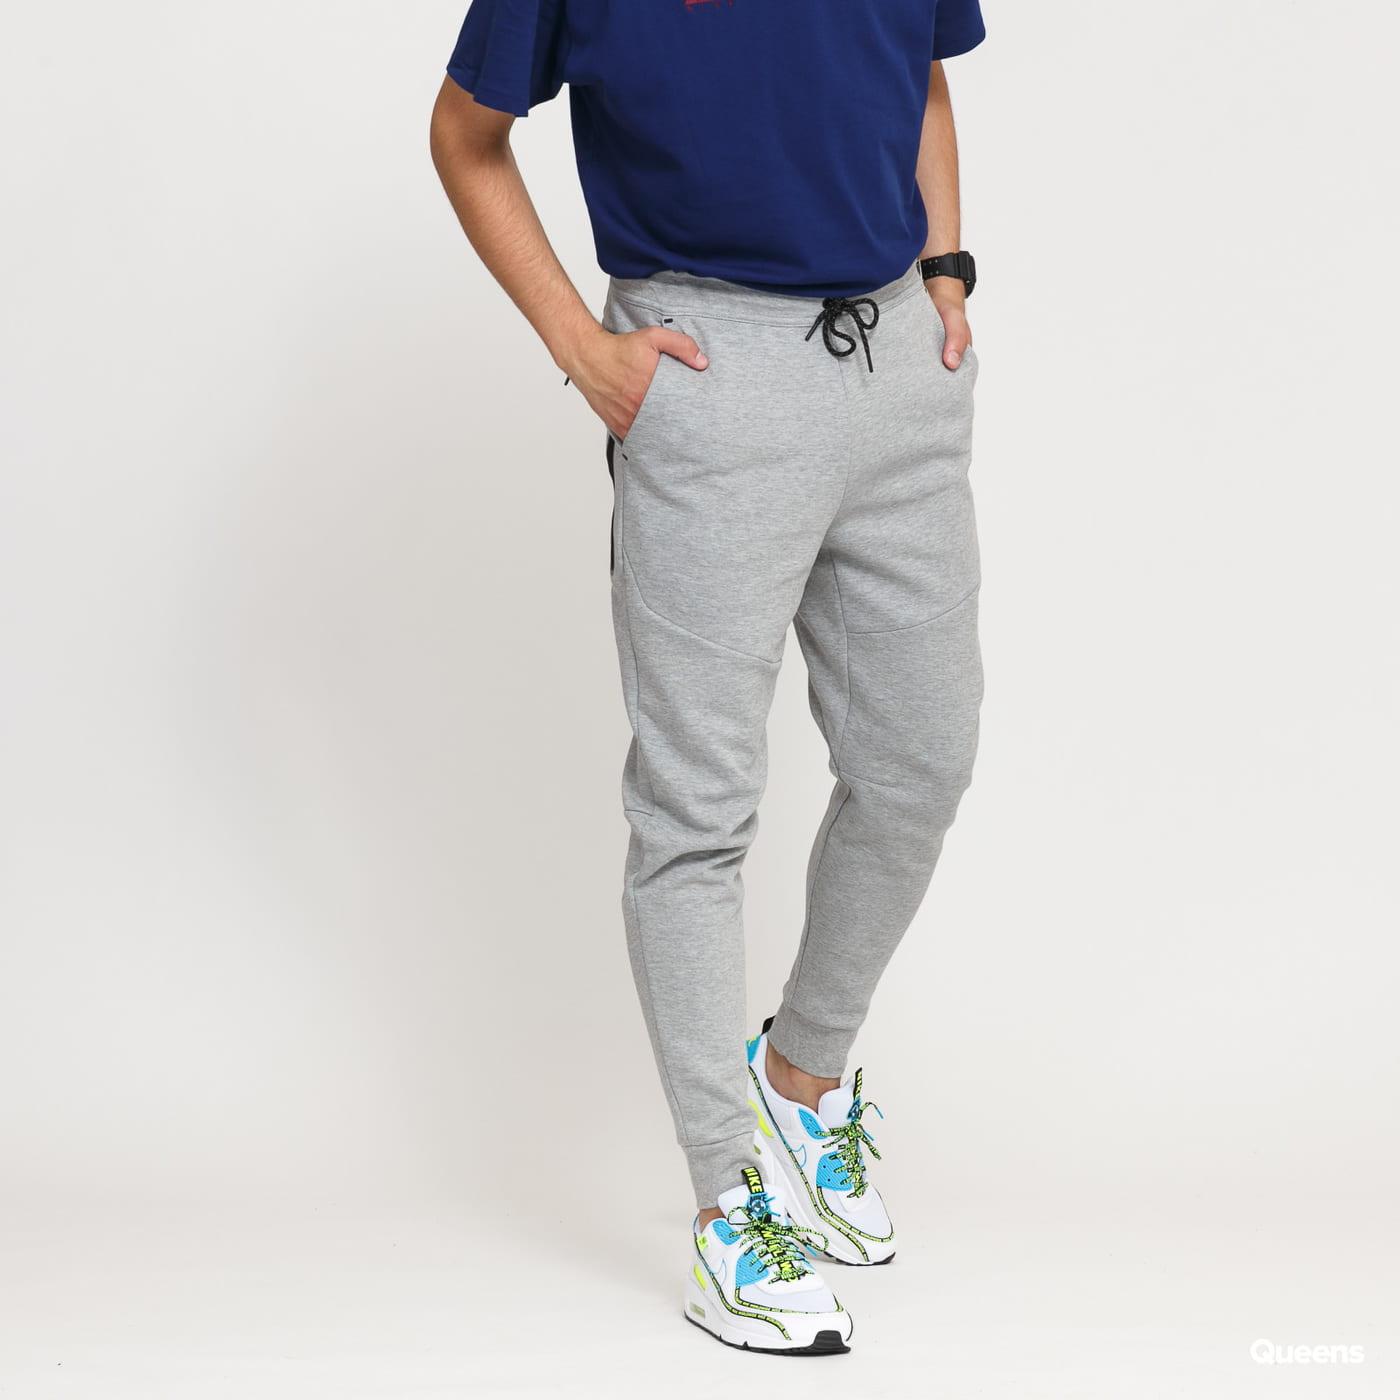 Nike M NSW Tech Fleece Jogger melagne šedé